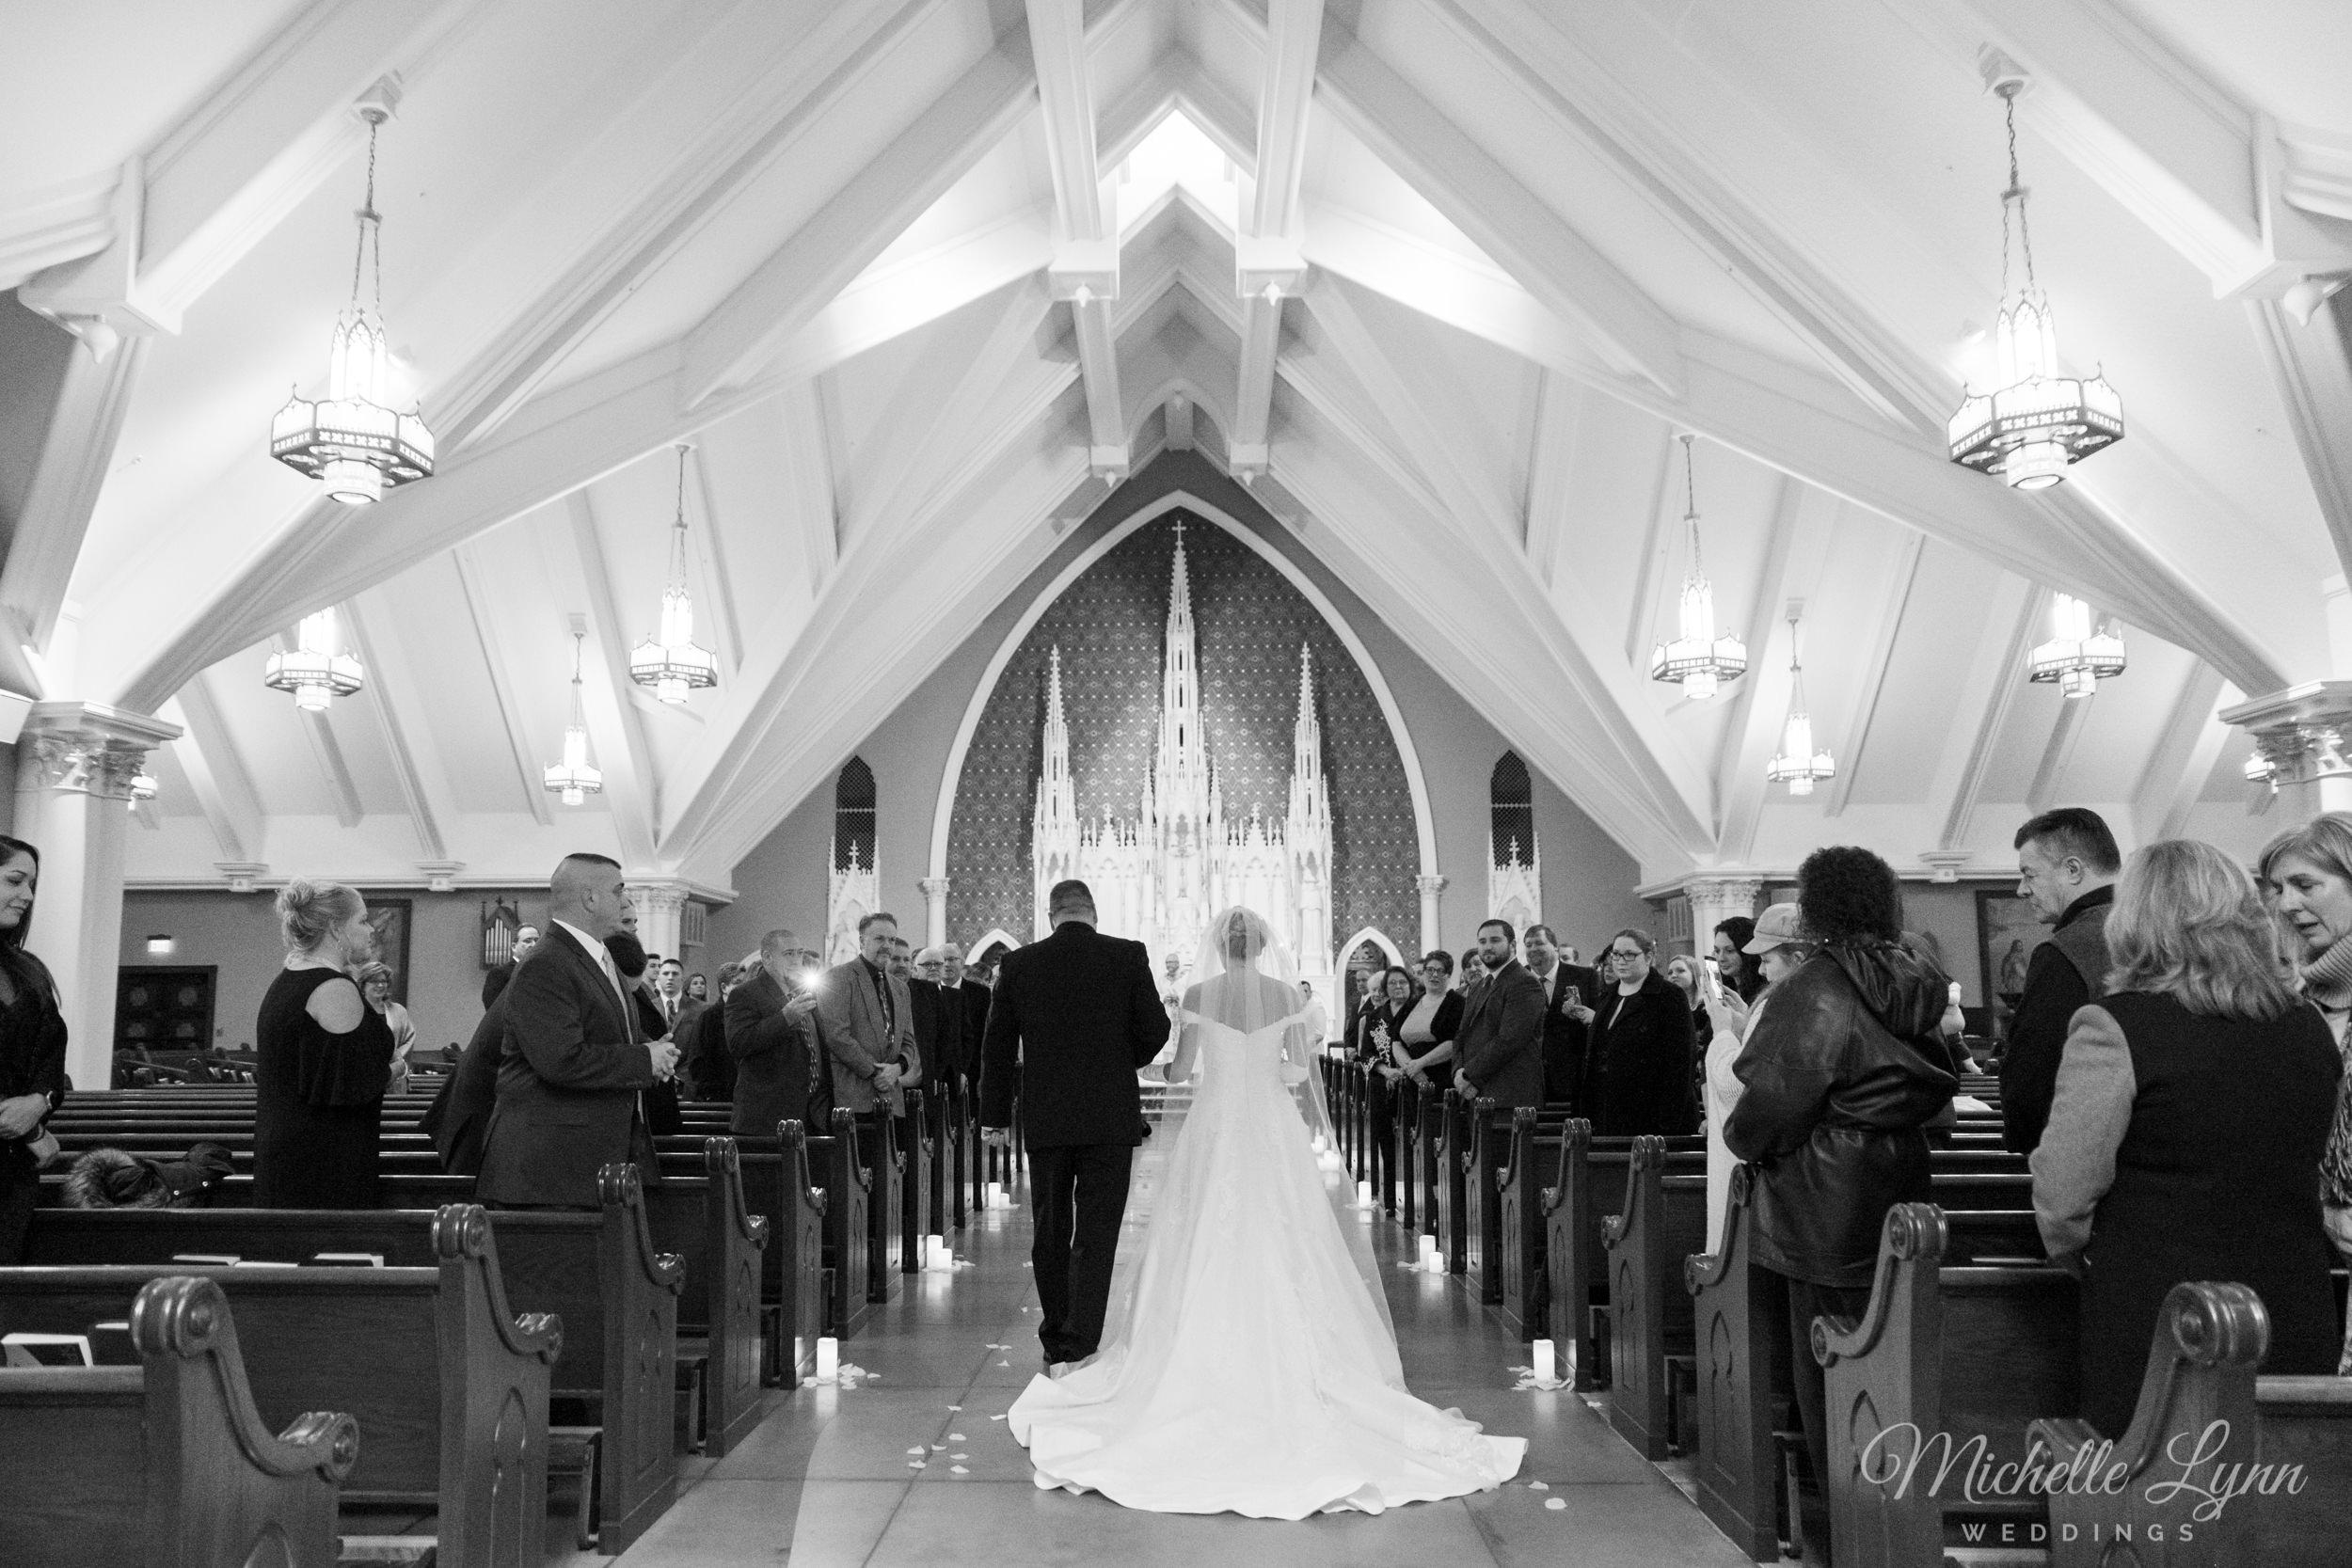 william-penn-inn-wedding-photography-mlw-50.jpg